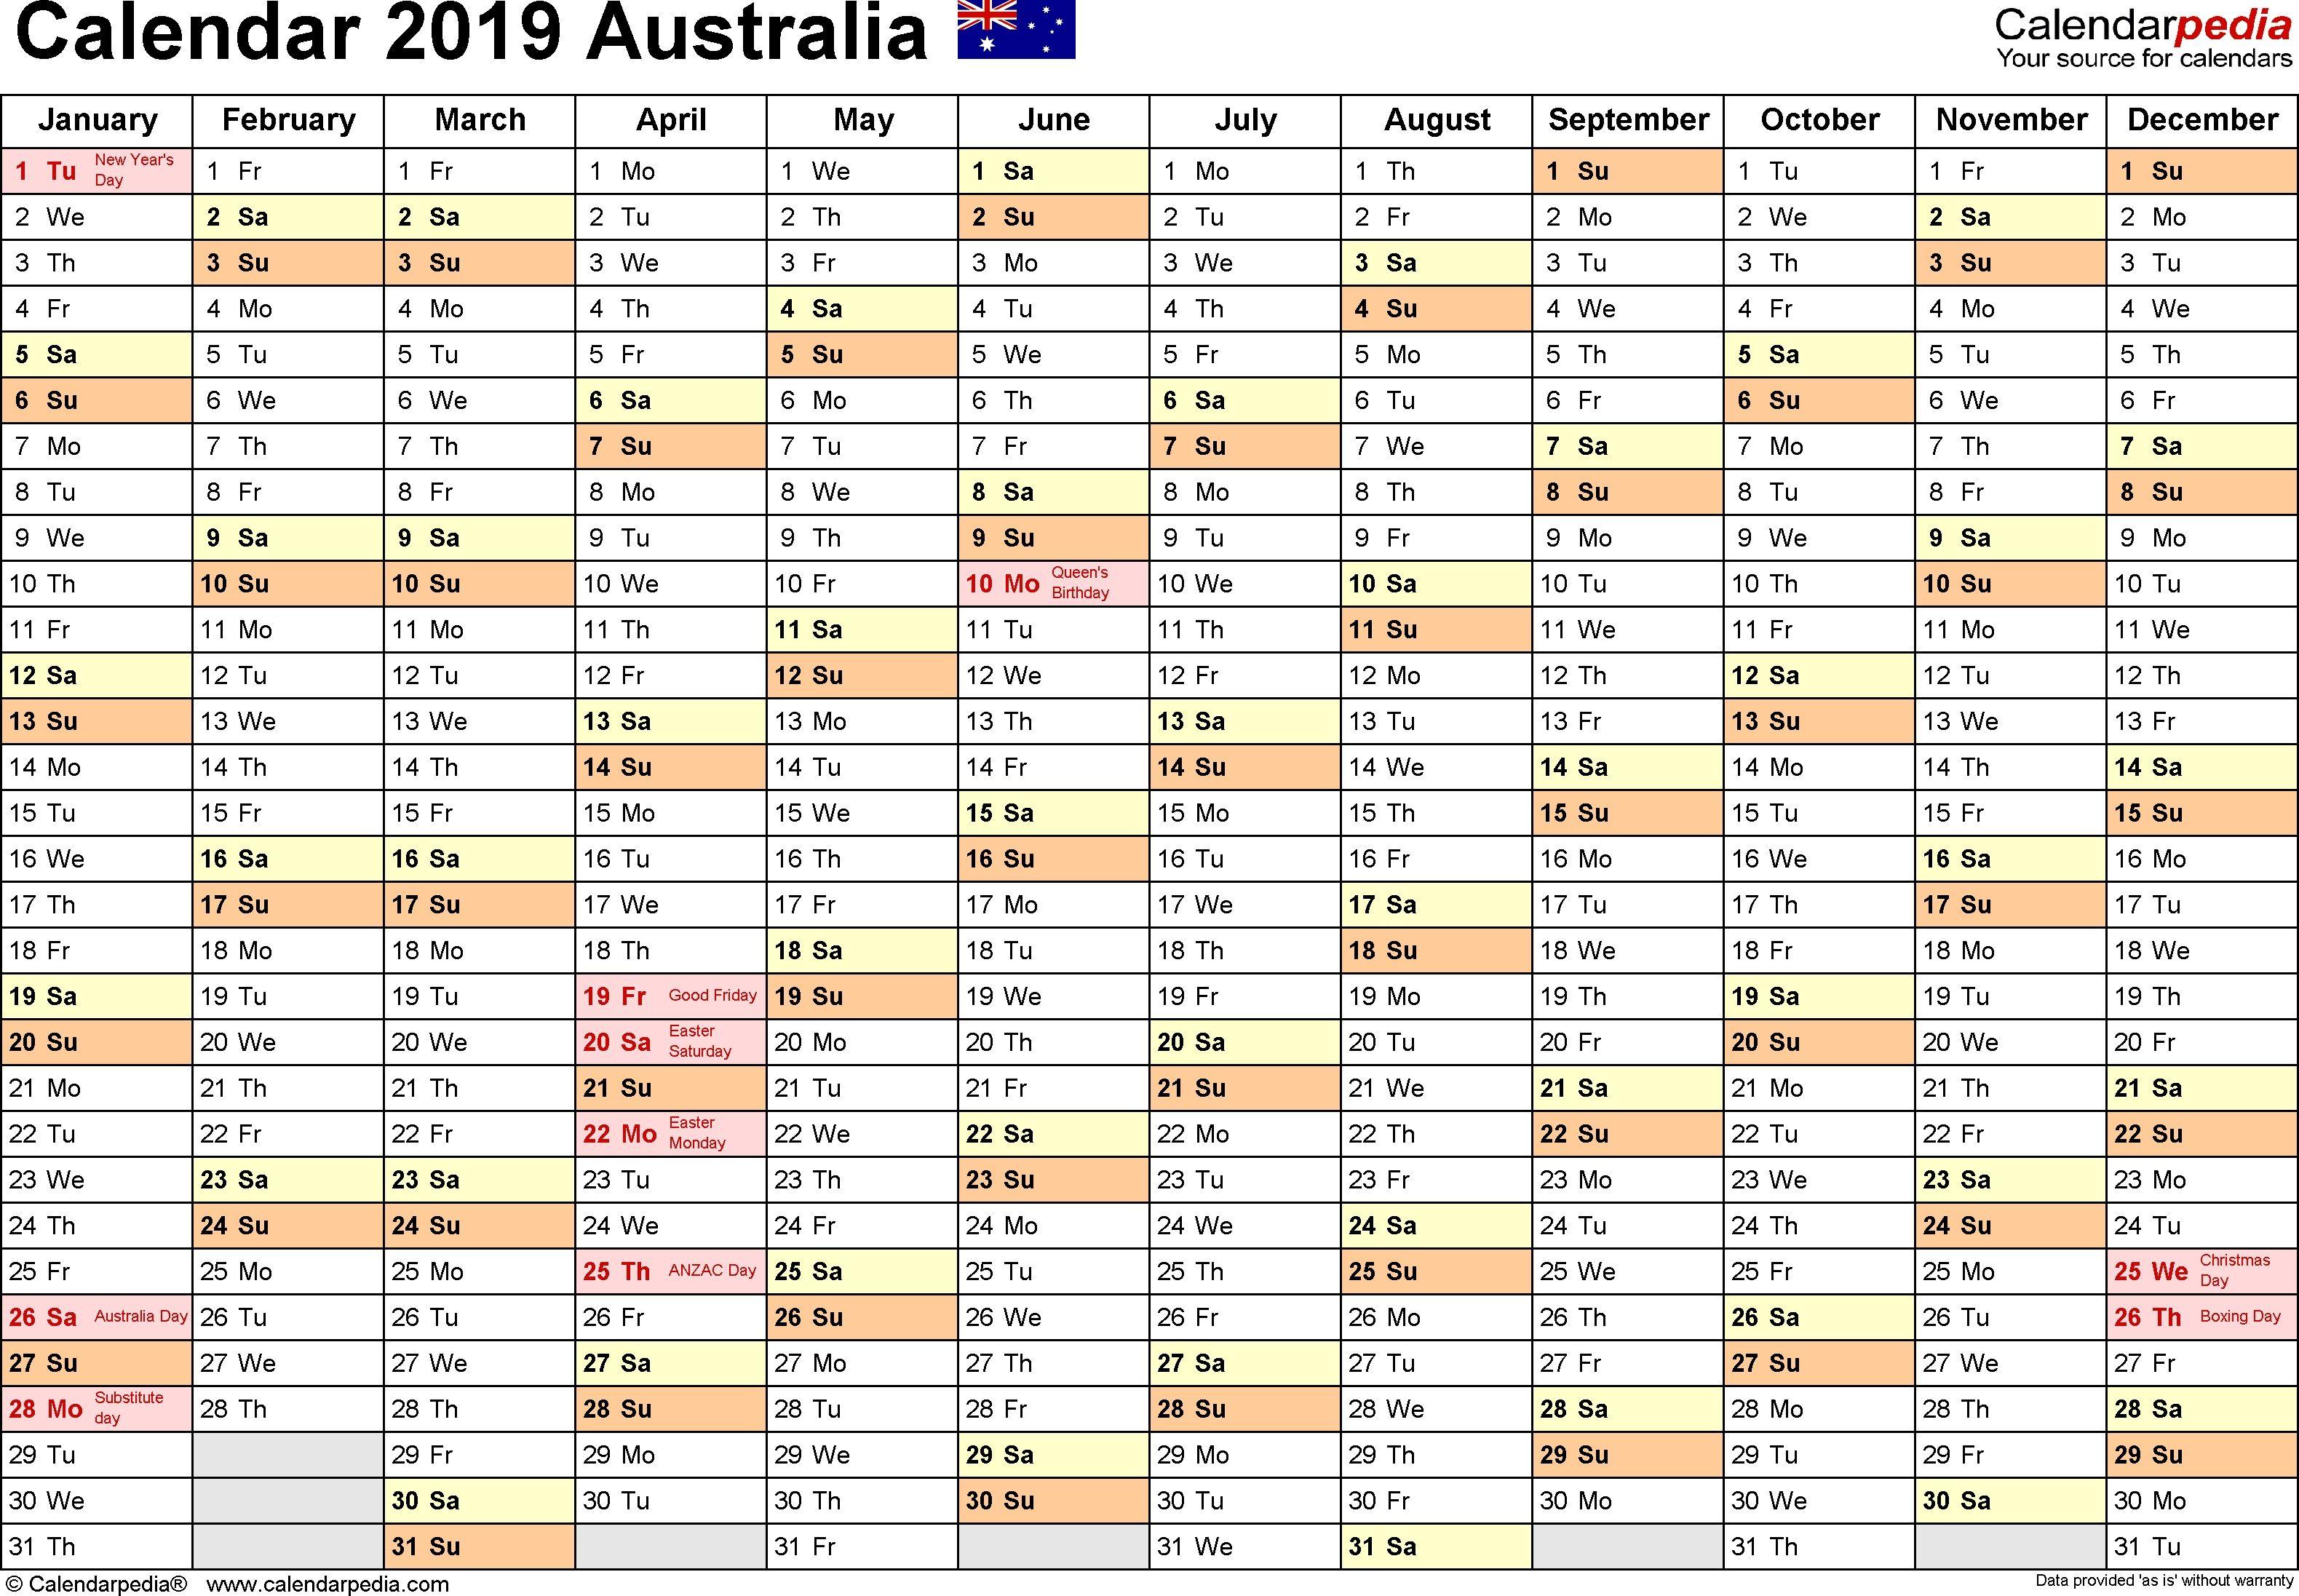 Australia Calendar 2019 Free Printable Excel Templates Catch Printable Calendar Template Free Printable Calendar Templates Calendar Printables